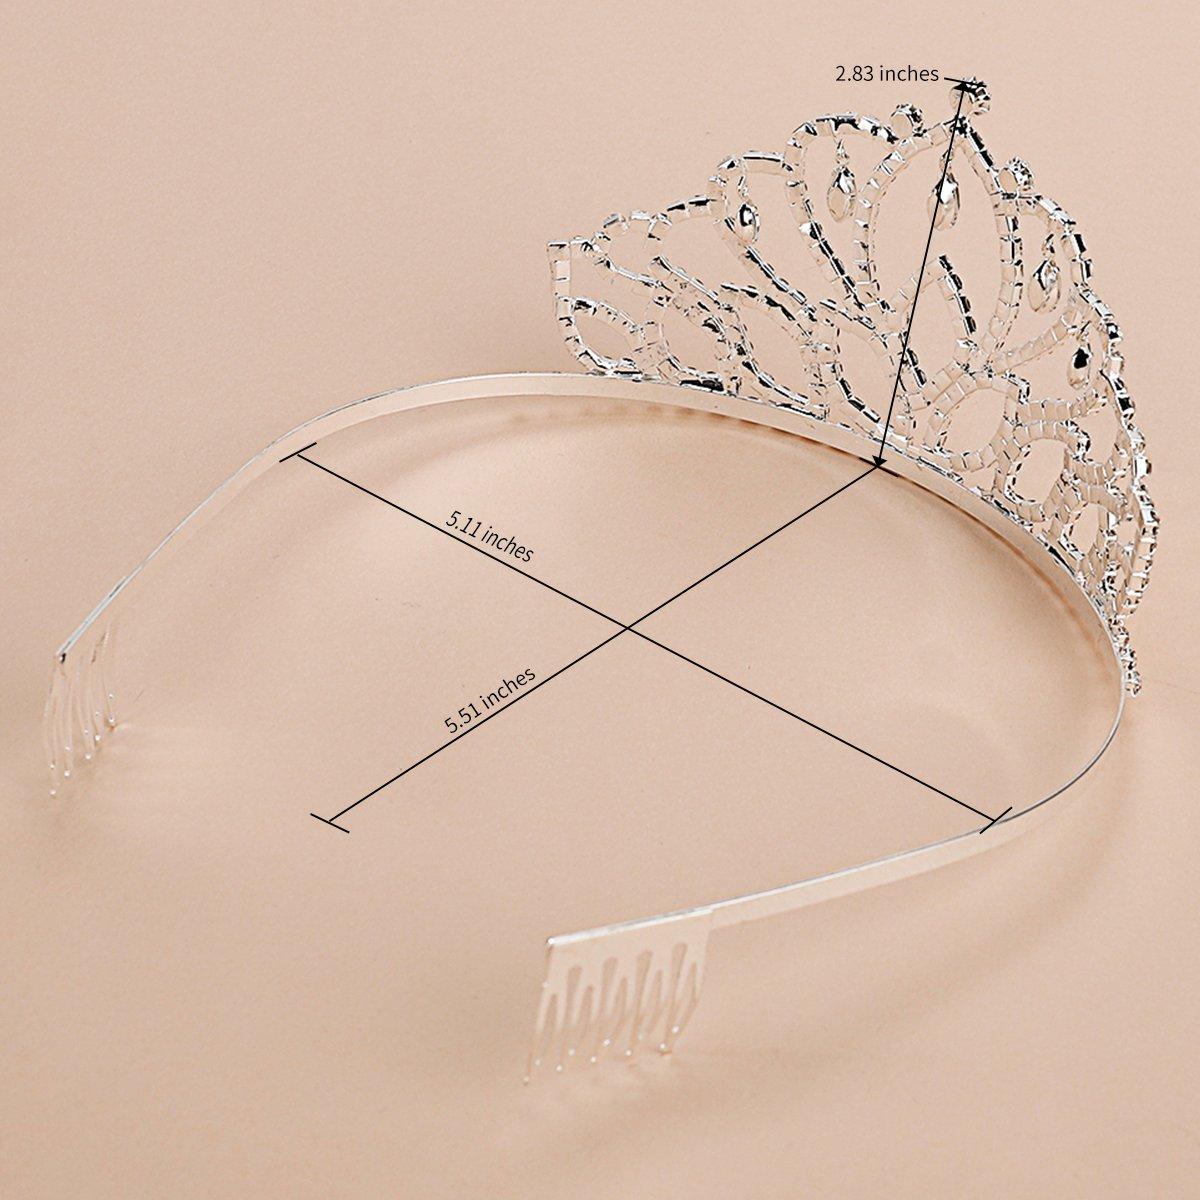 Elegant Tiara Crystal Hair Crown - Rhinestones Headband for Queen, Bridal, Princess in Wedding, Party and Birthday 1-2 - by NIPOO by Nipoo (Image #5)